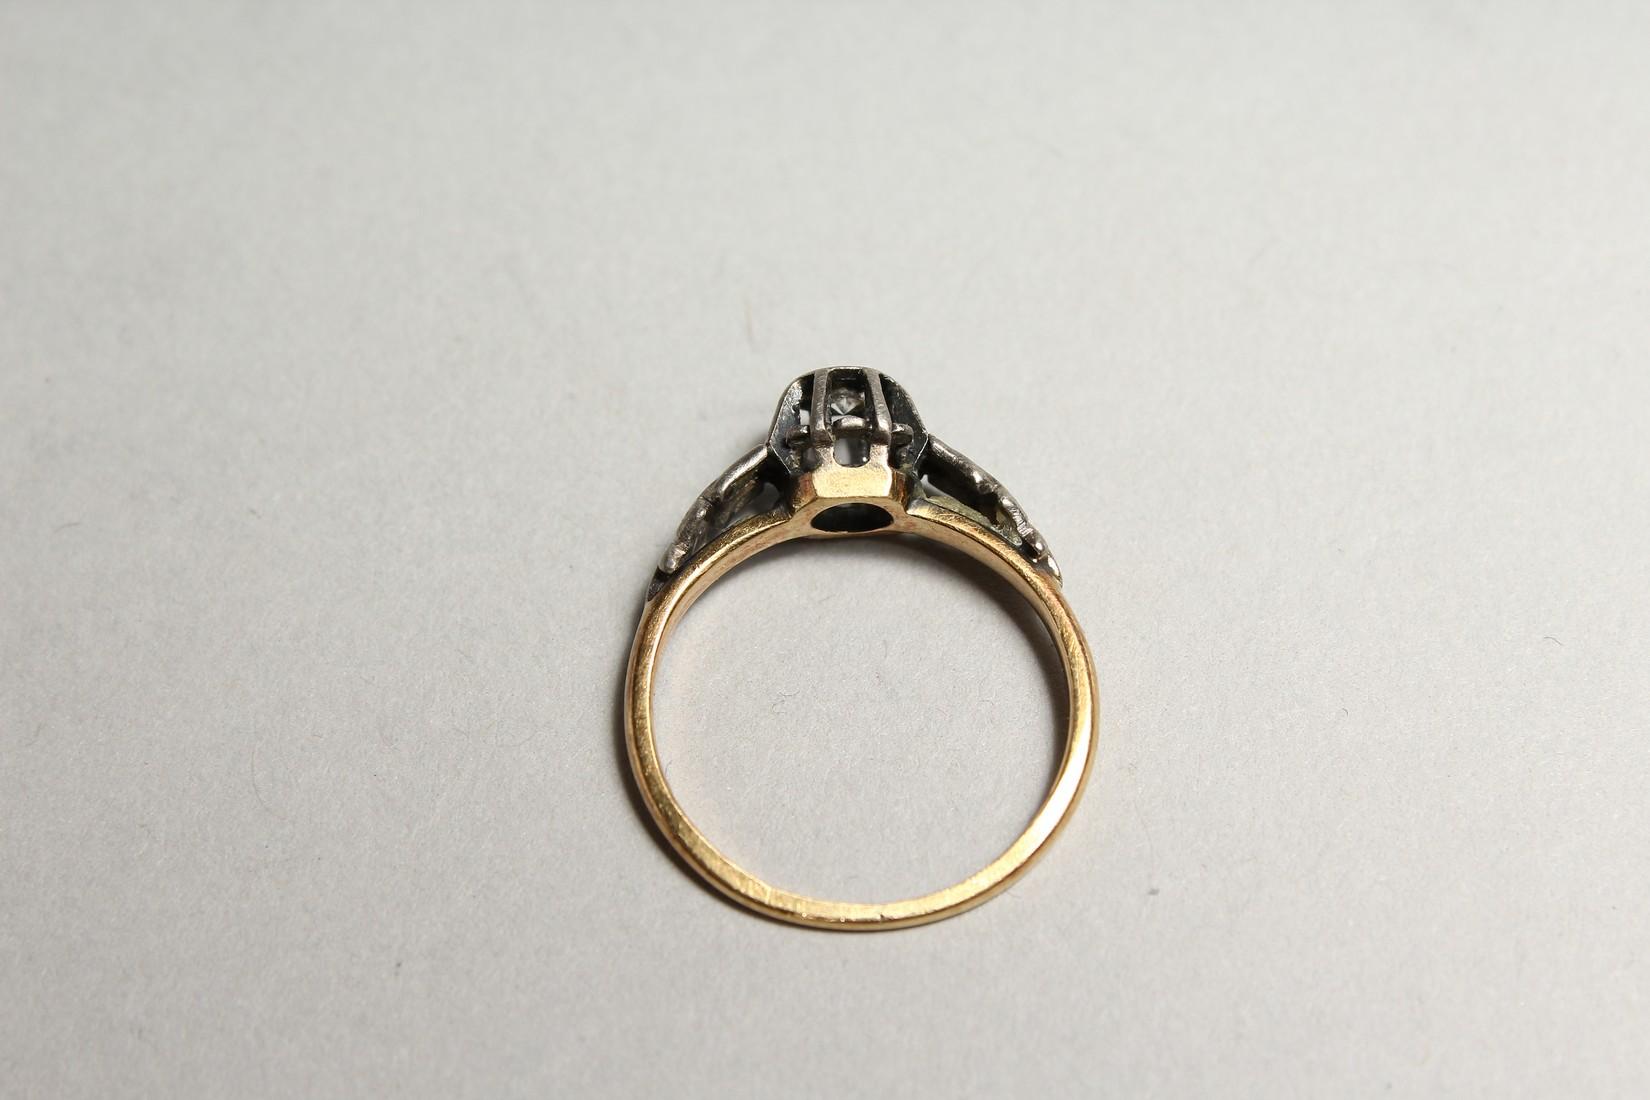 A GOOD 18CT GOLD DIAMOND SET RING - Image 4 of 5